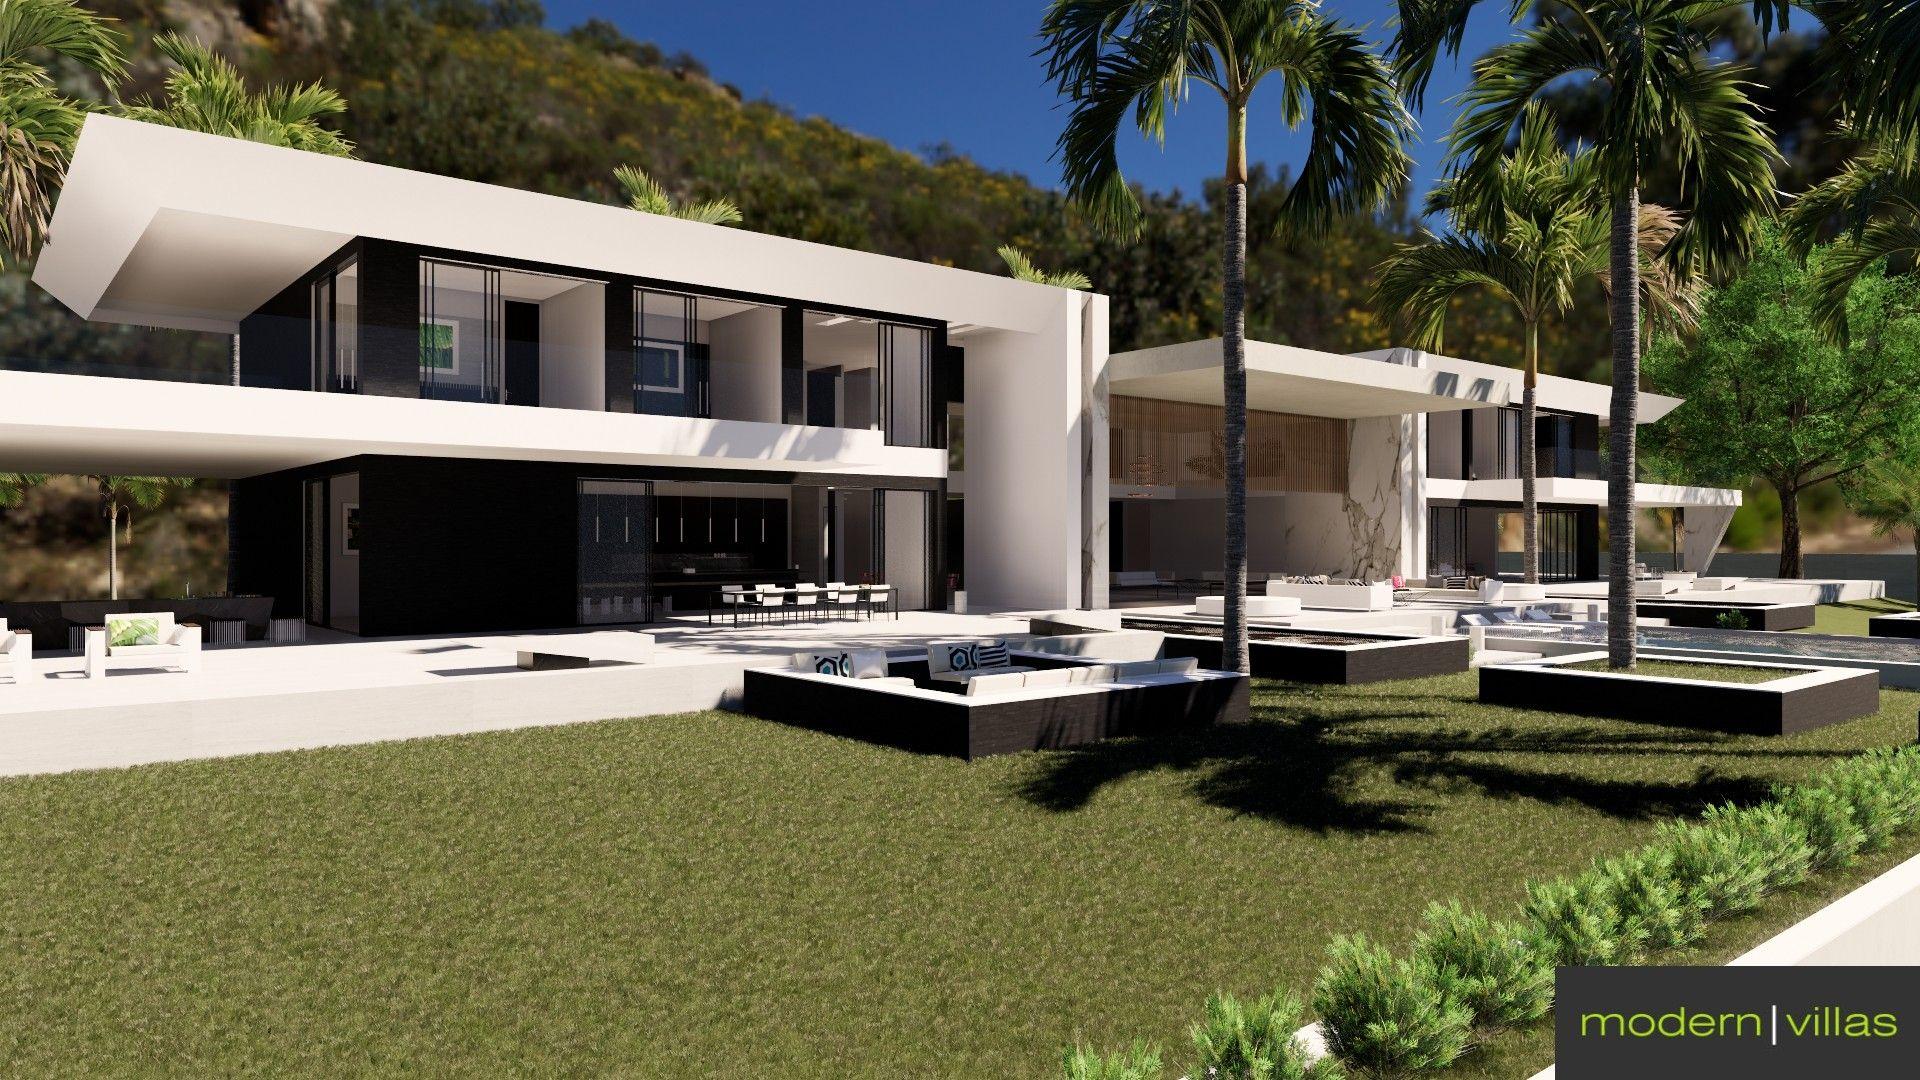 Modern Villa Marbella Club Modern Villas Marbella Property Marbella Club Villa